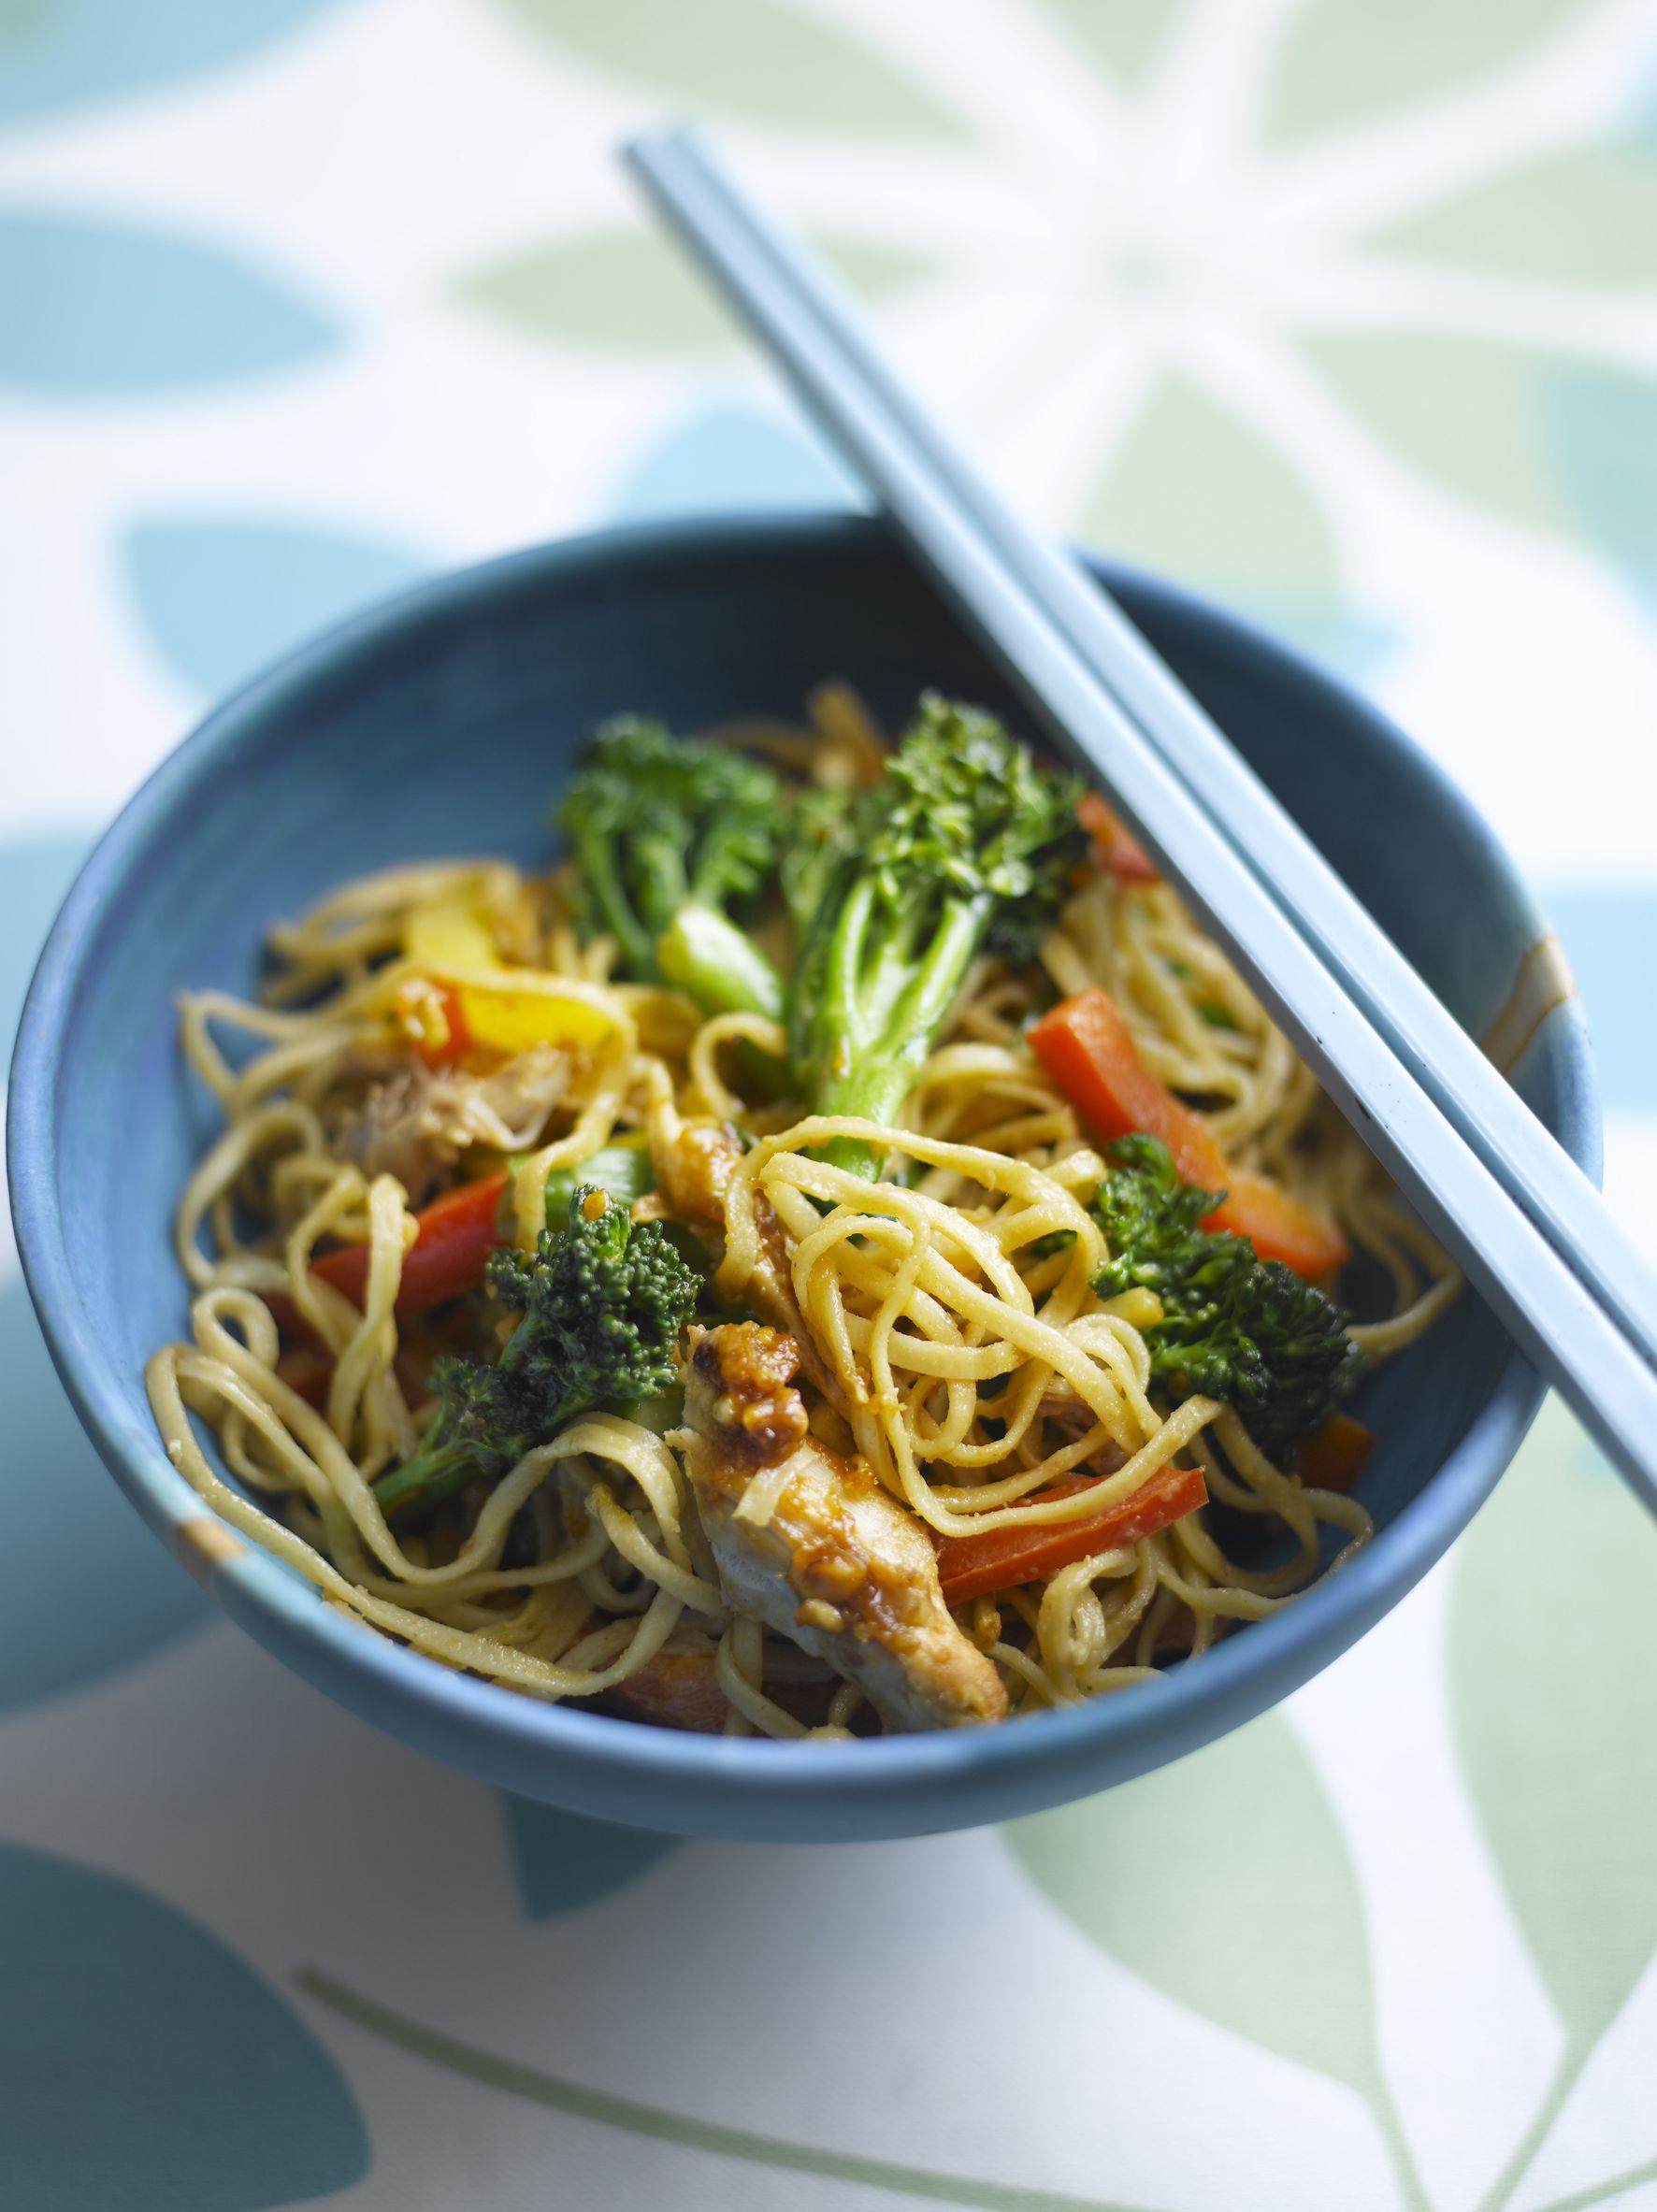 peoria chicken noodle dinner - HD1772×2366